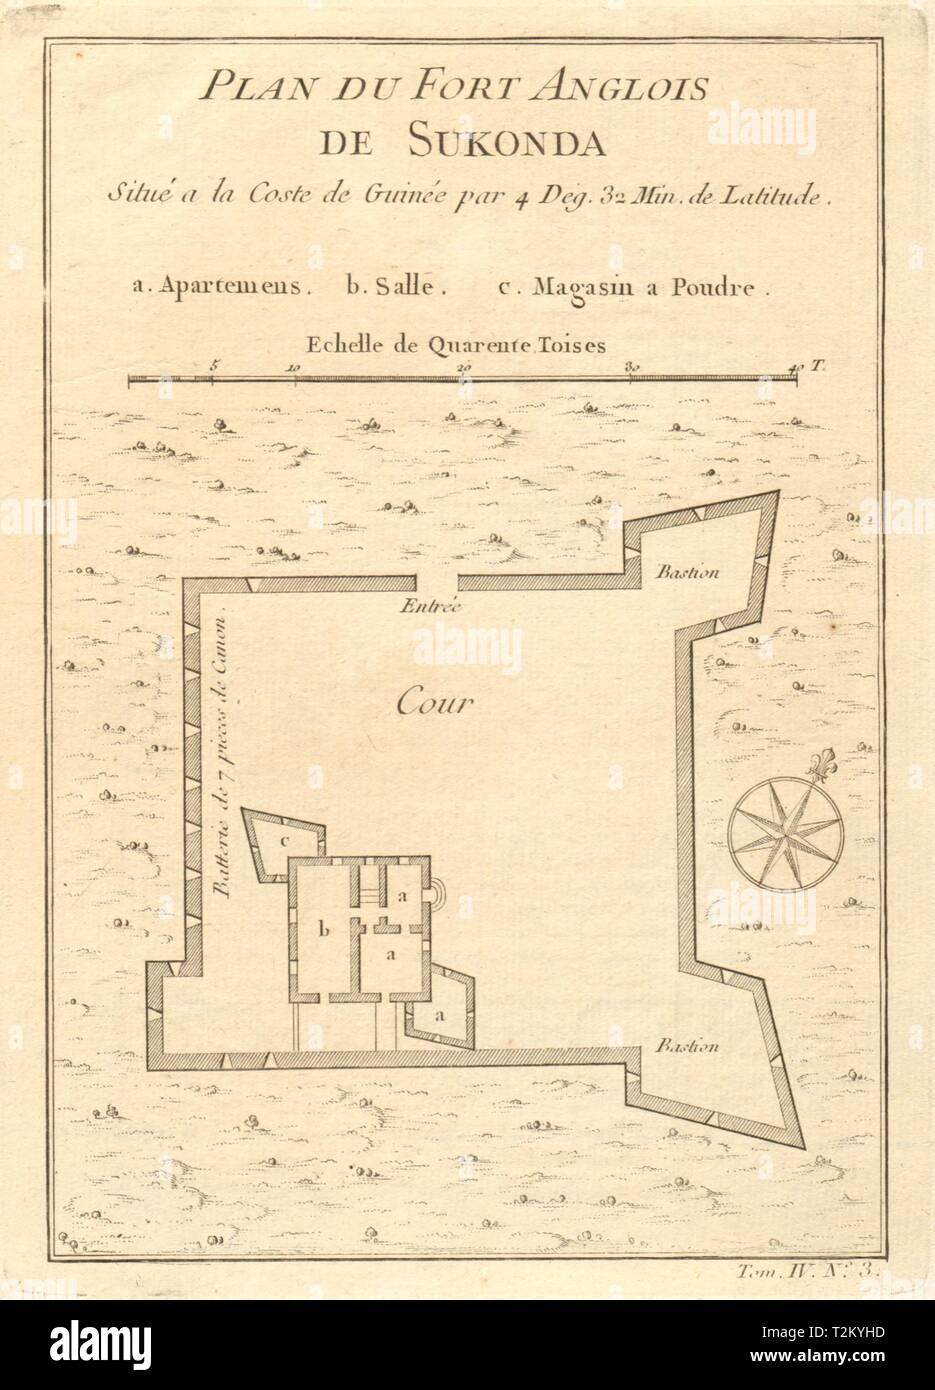 Anglois plan du fort anglois de sukonda'. fort sekondi, takoradi